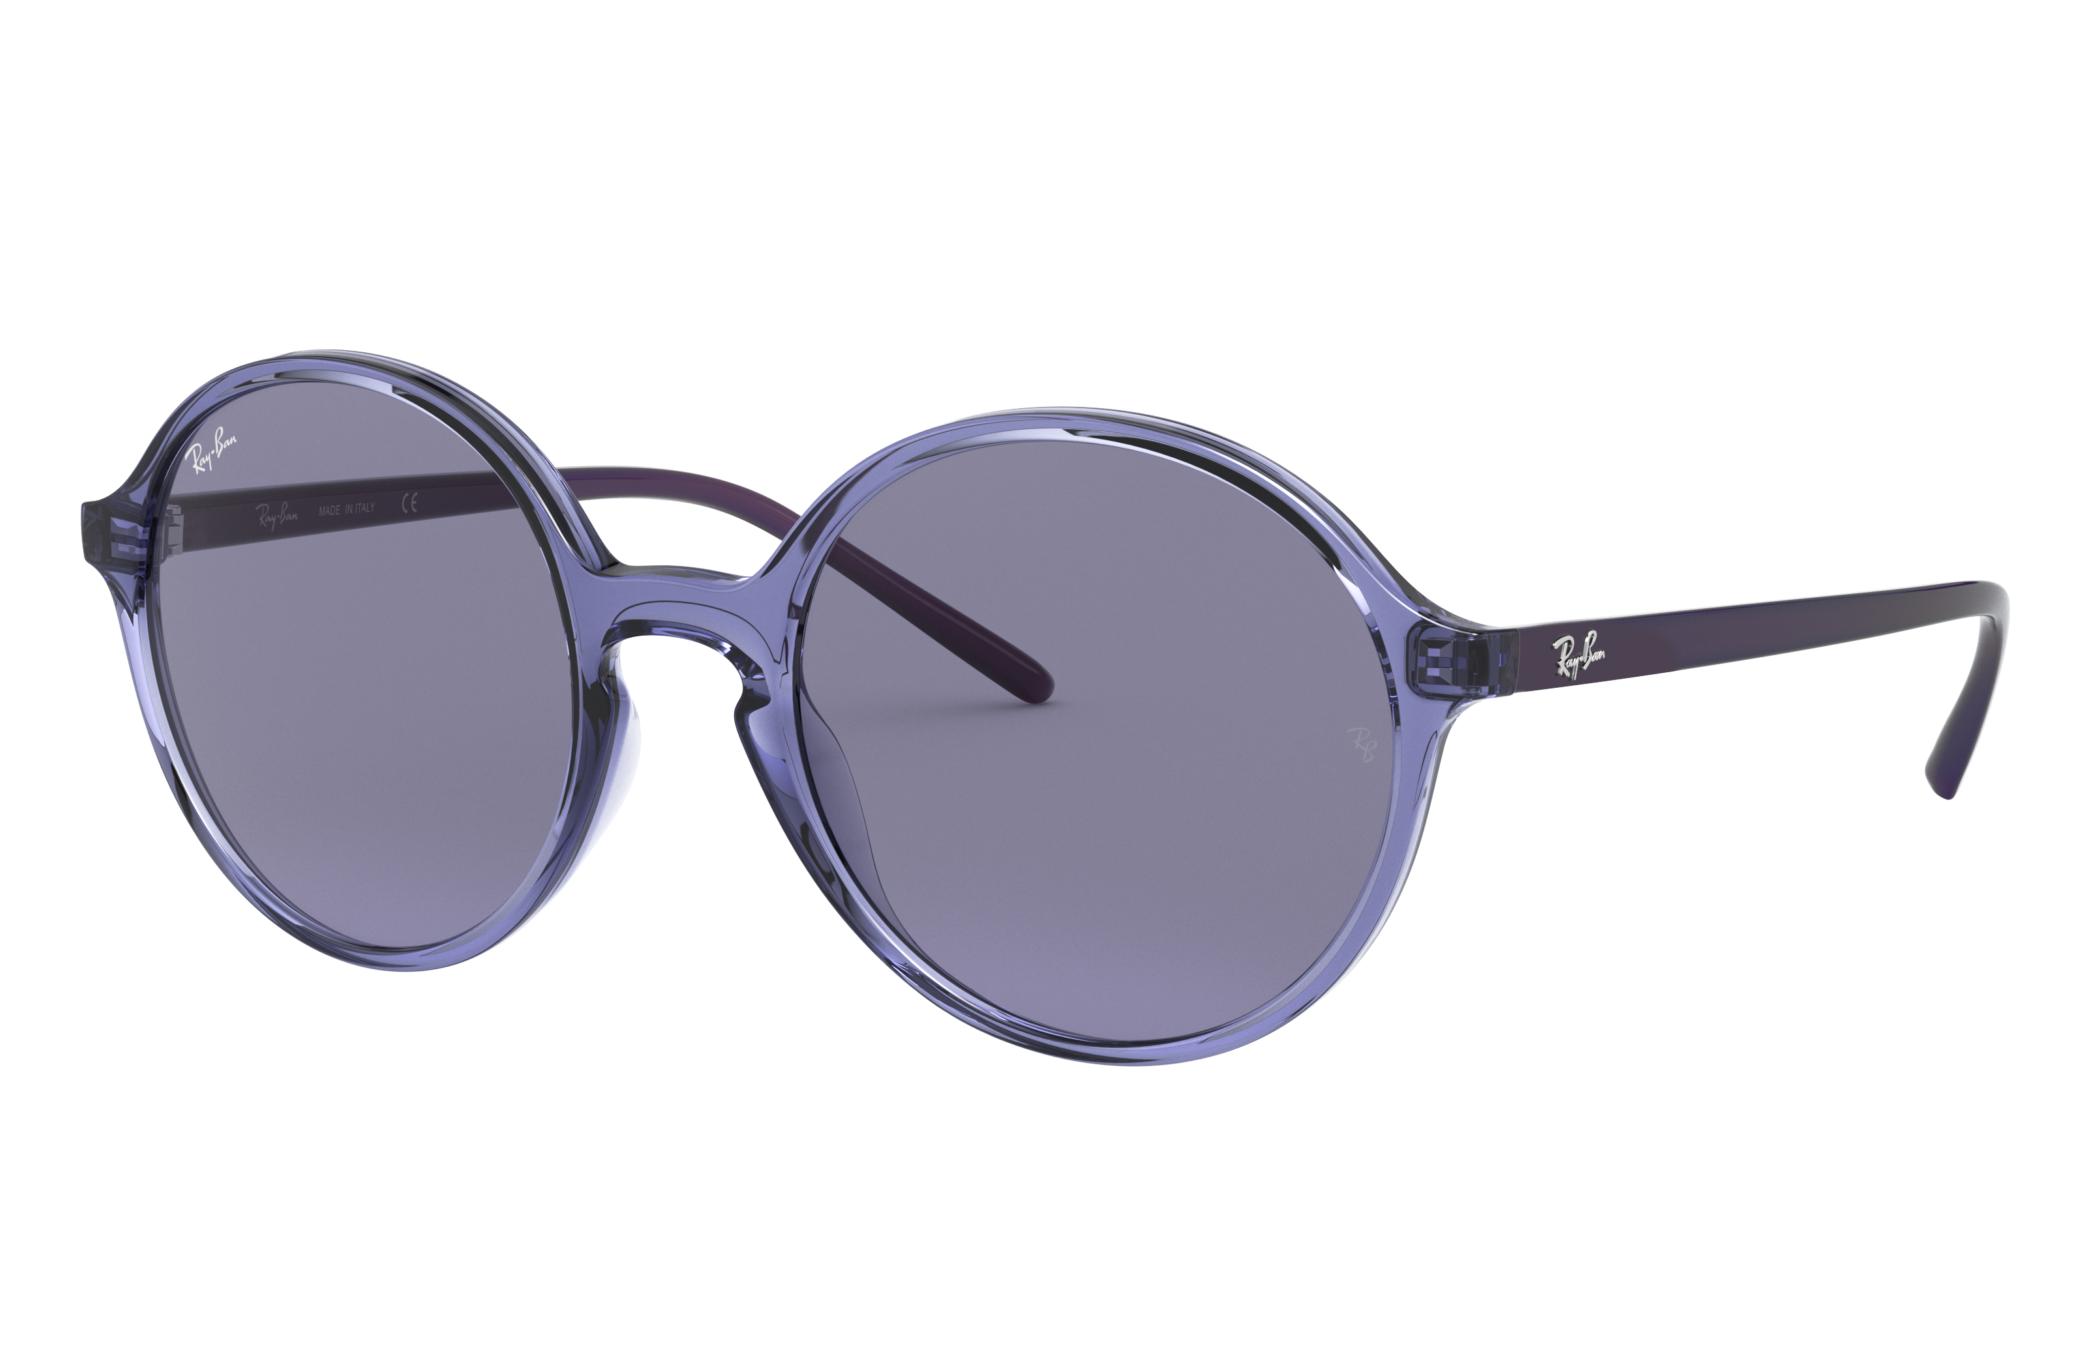 Ray-Ban Rb4304 Violet, Blue Lenses - RB4304